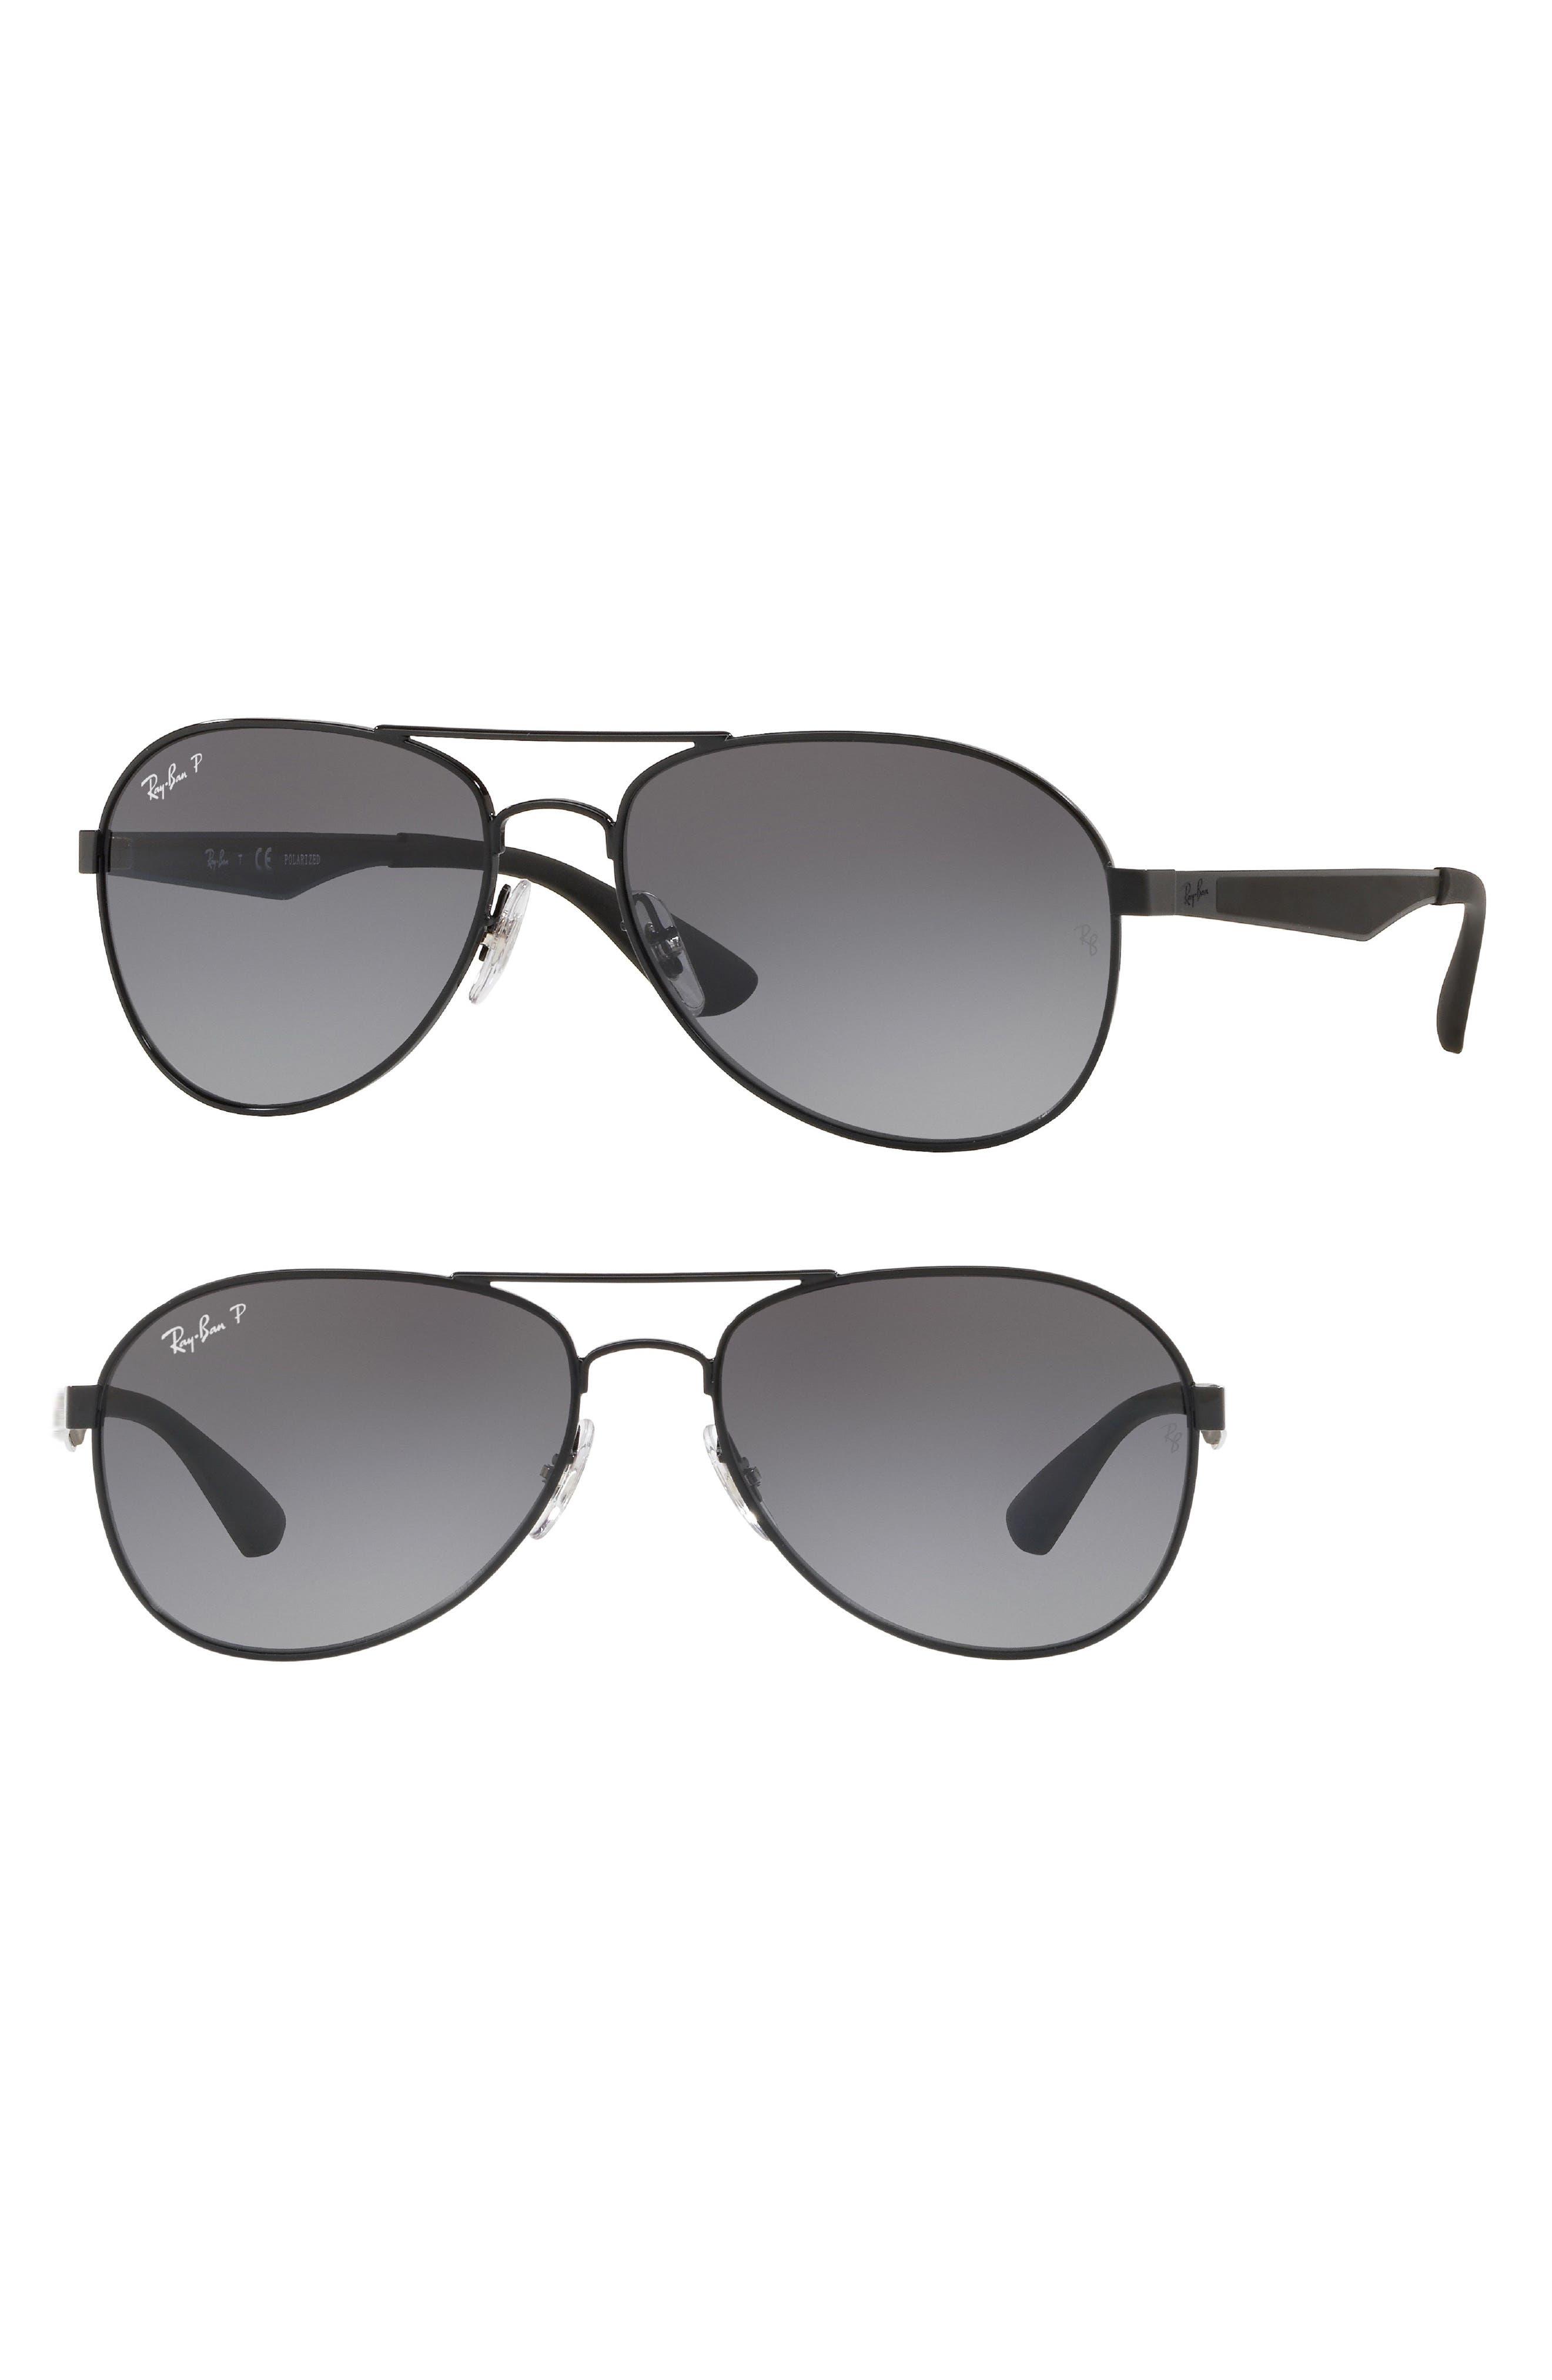 Active Lifestyle 61mm Polarized Pilot Sunglasses,                             Main thumbnail 1, color,                             Black